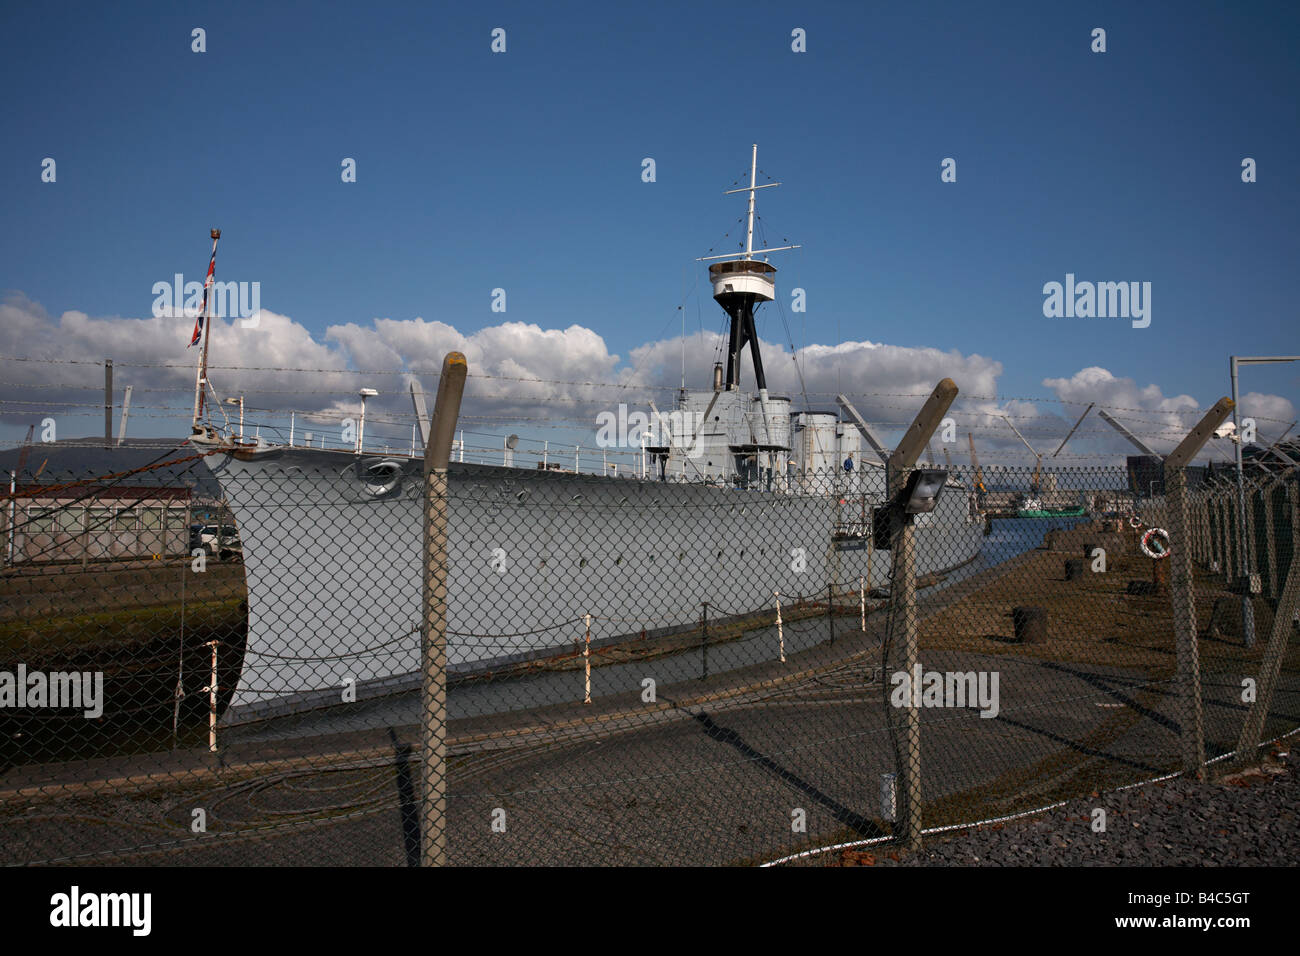 HMS Caroline belfast city centre northern ireland uk Stock Photo